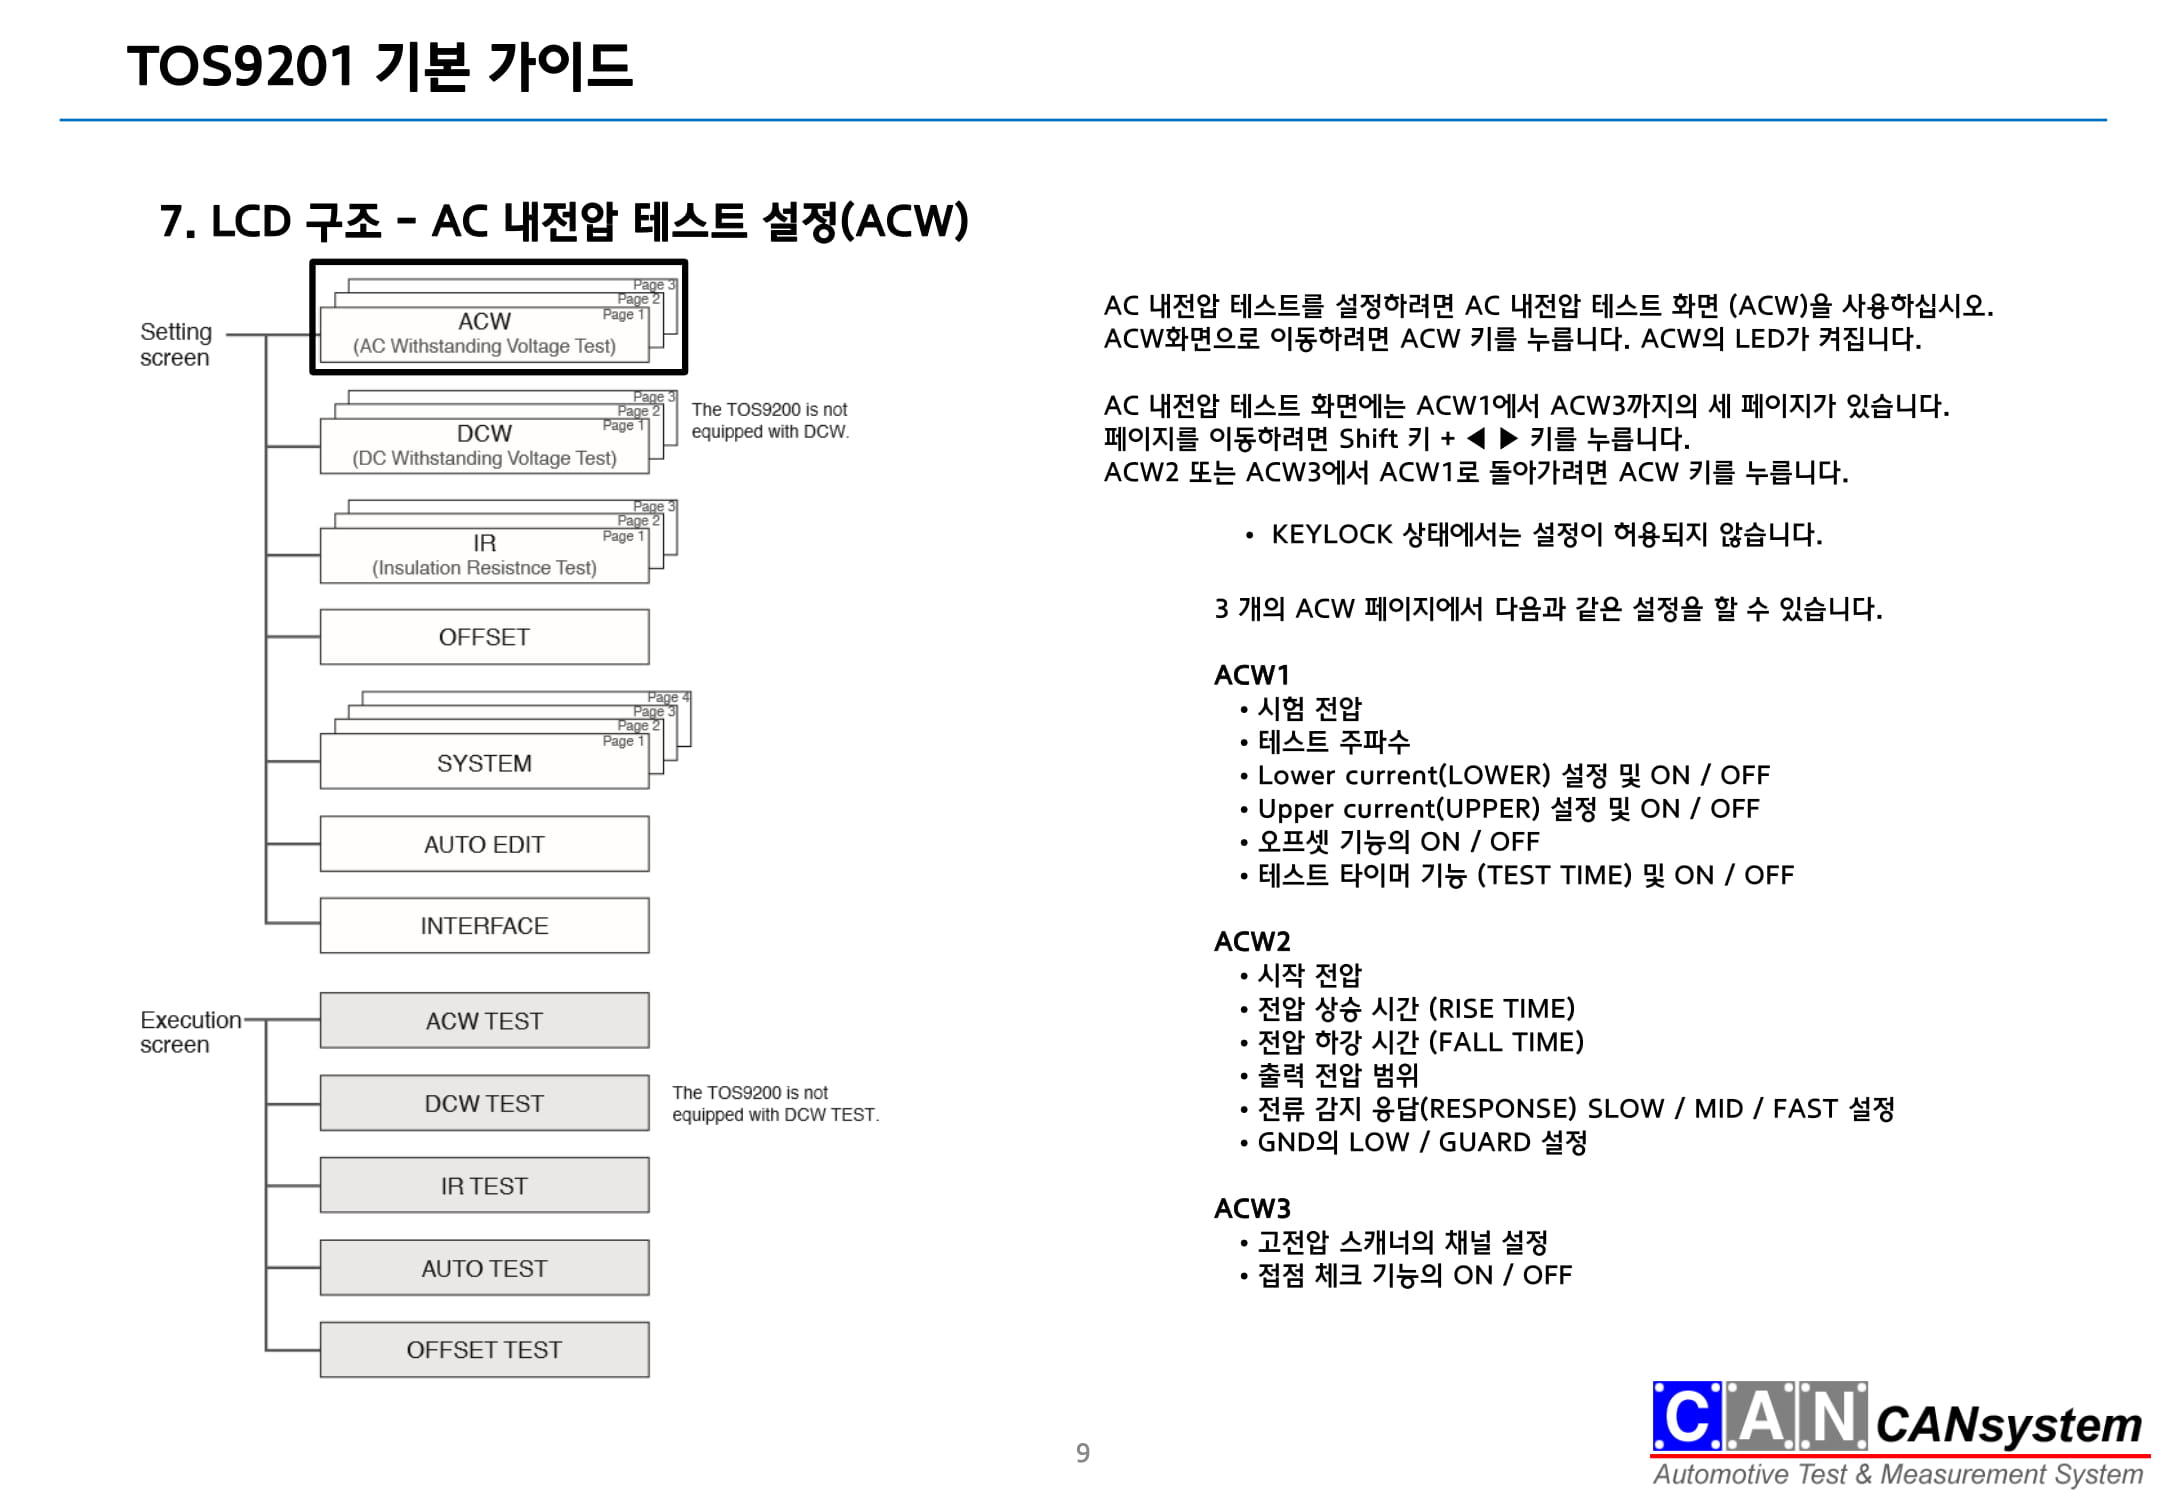 KIKUSUI TOS9201 국문 이용가이드-09.jpg